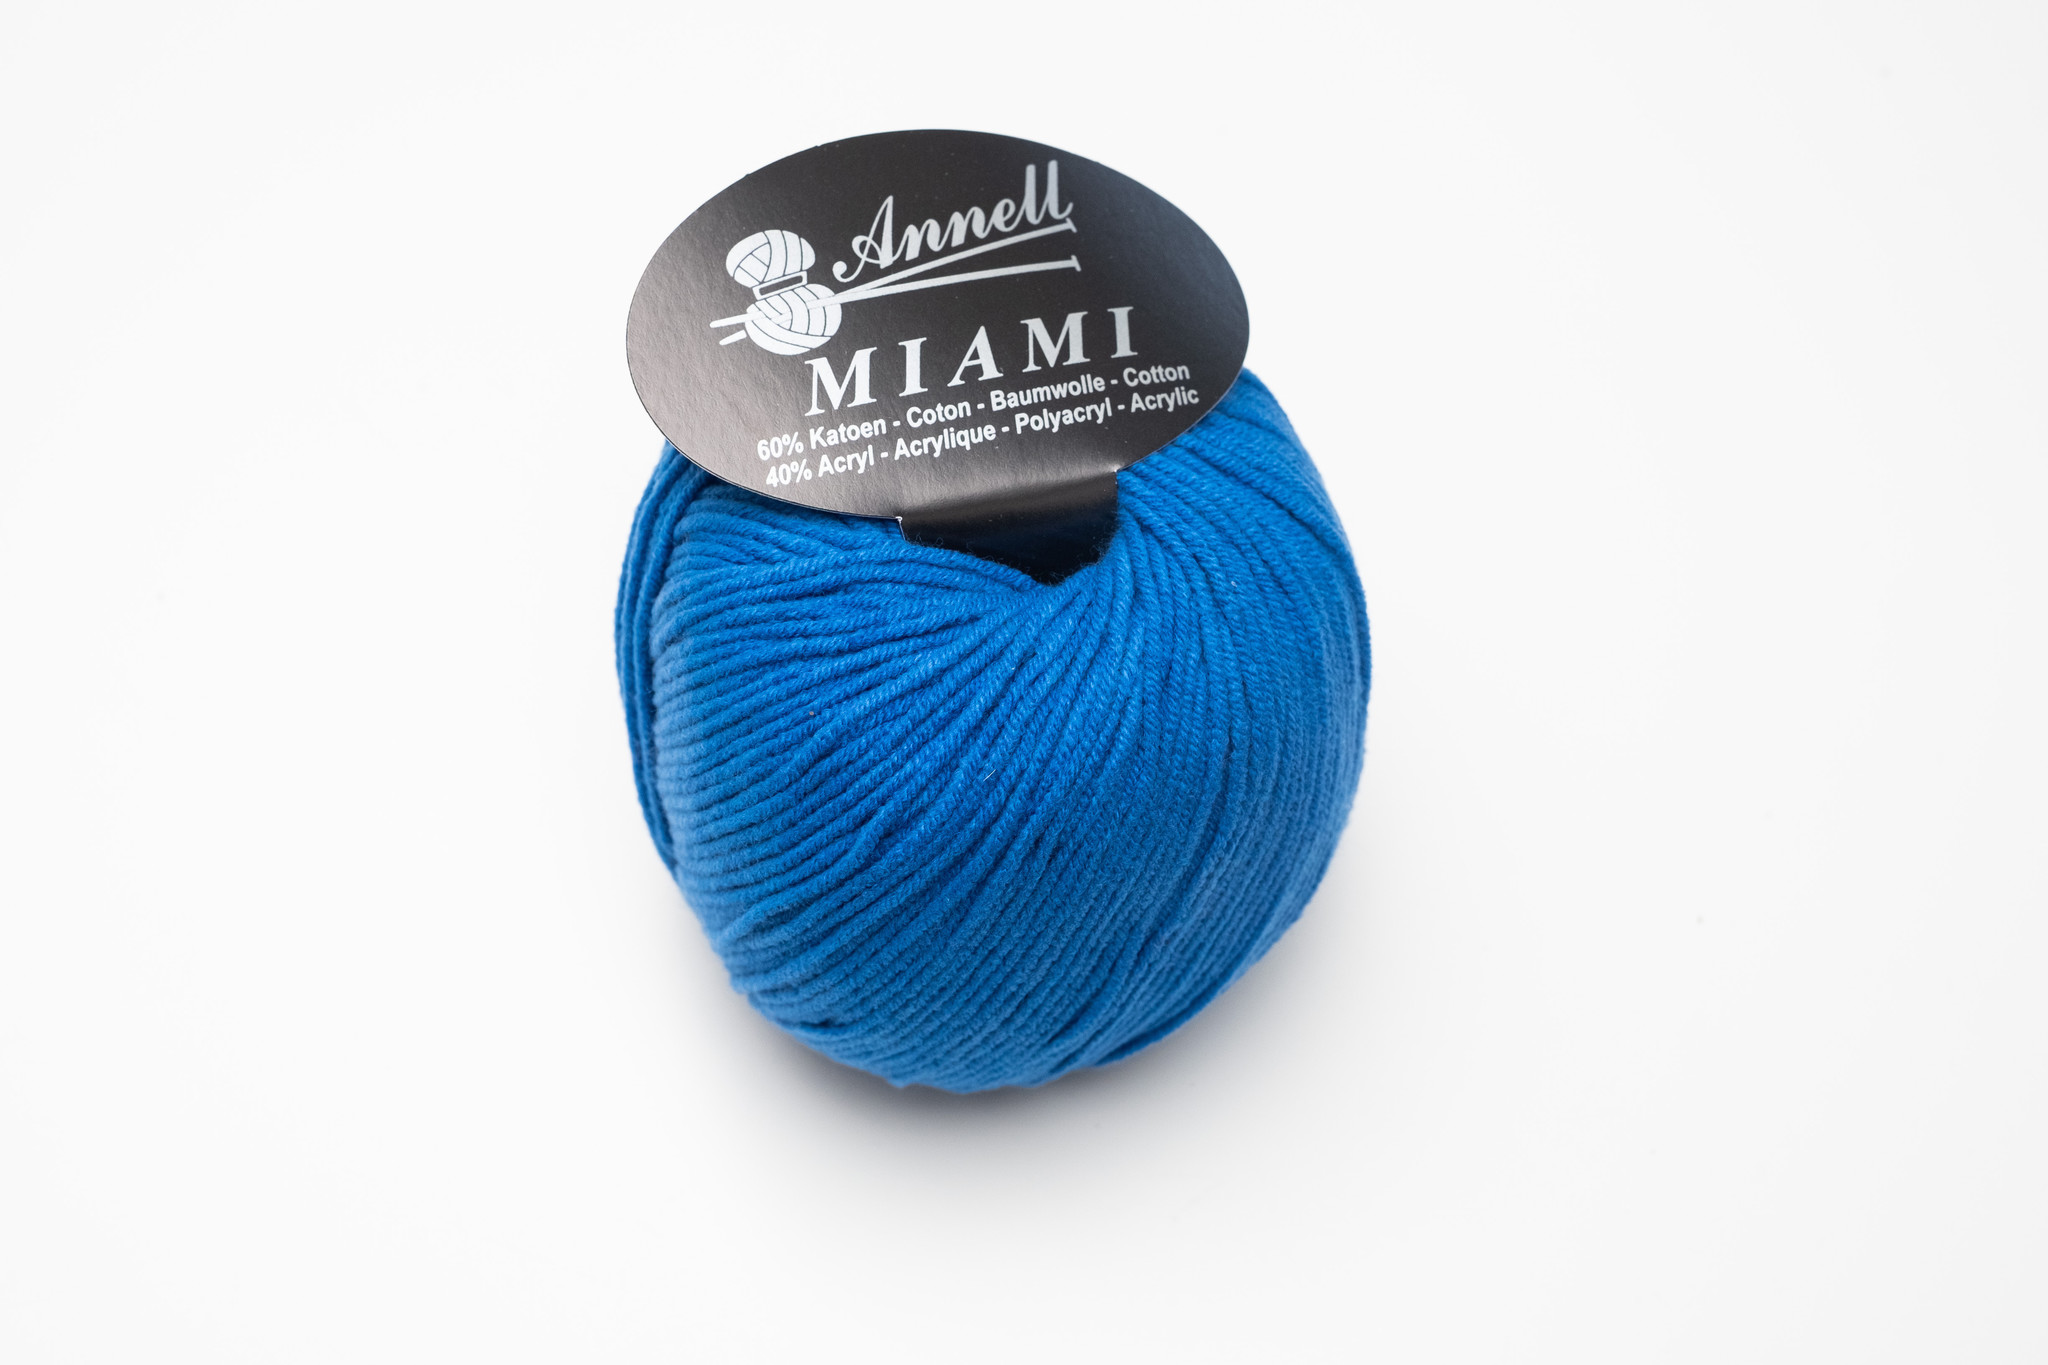 Annell Annell Miami - Kleur 8938